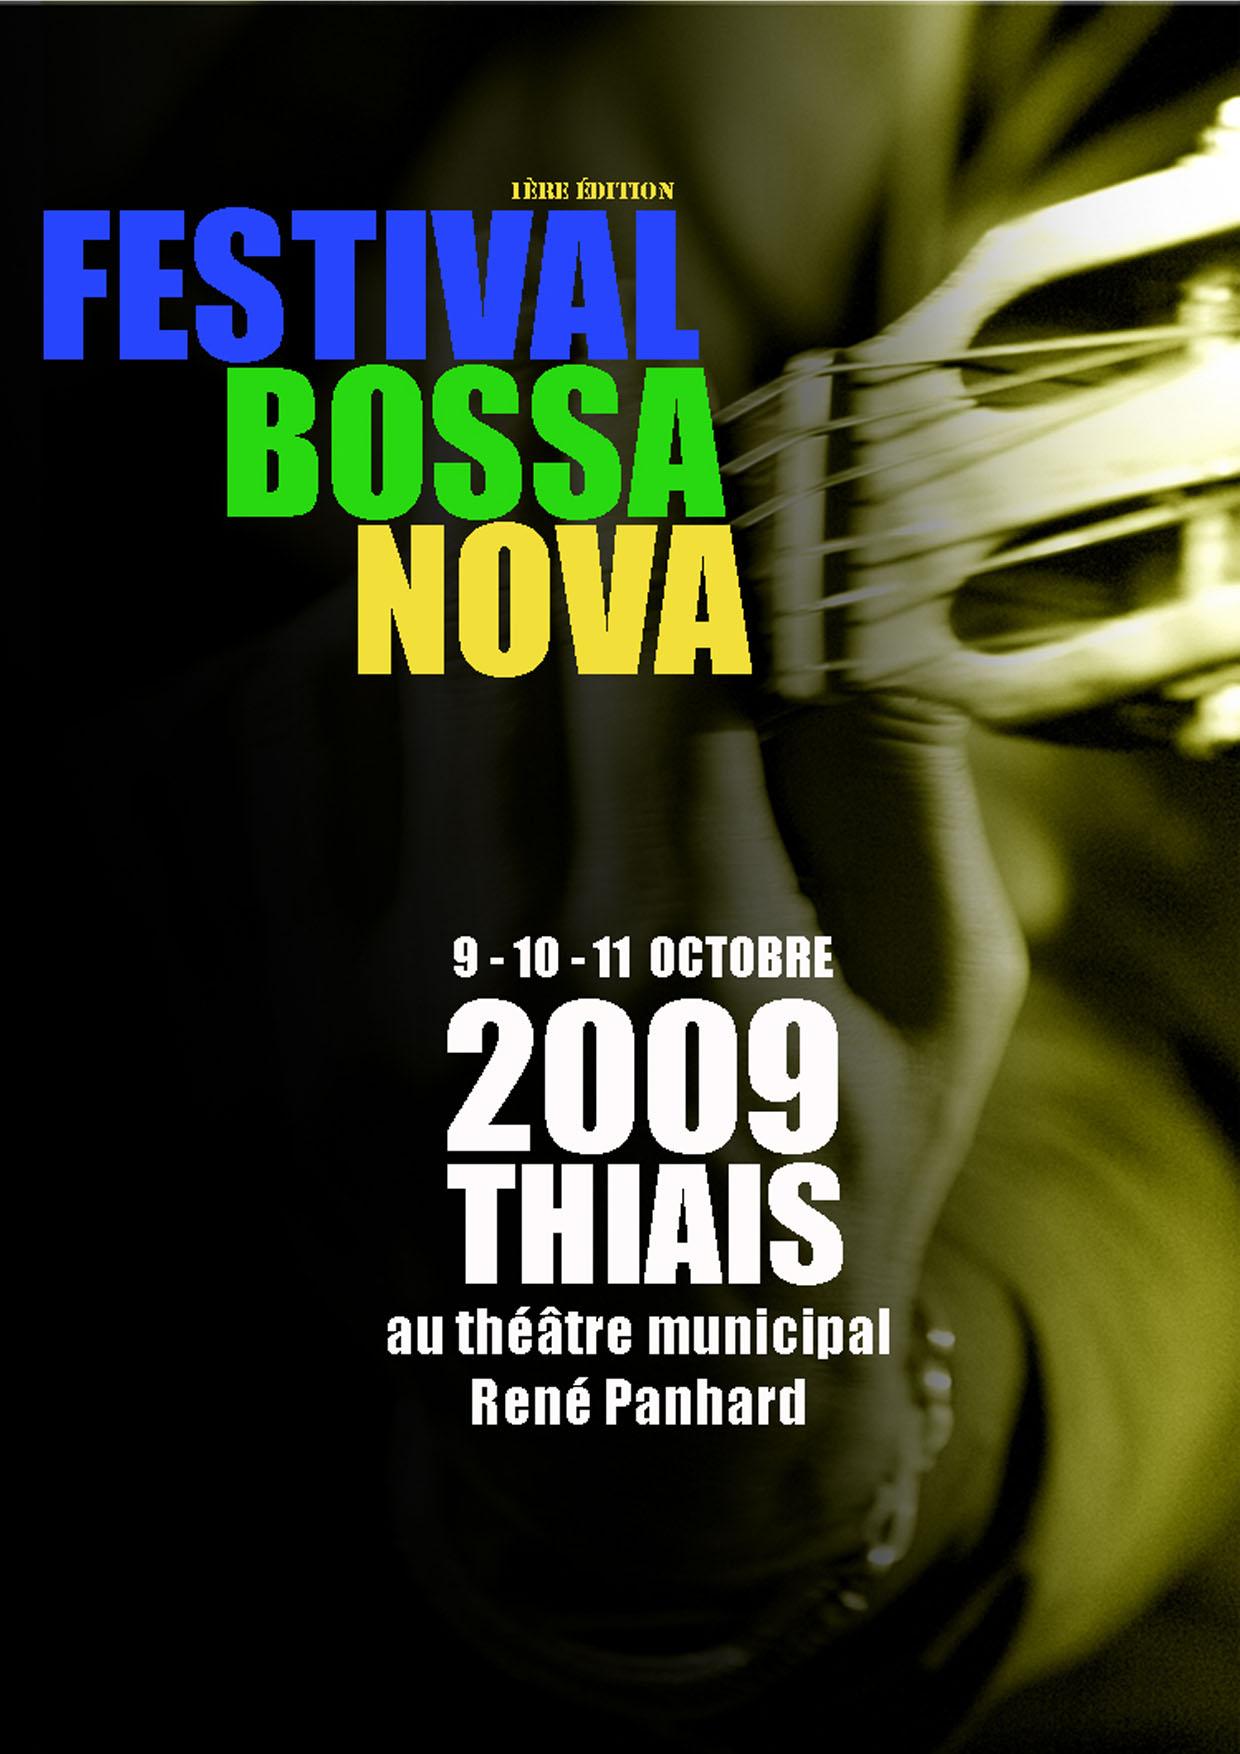 bossa nova history